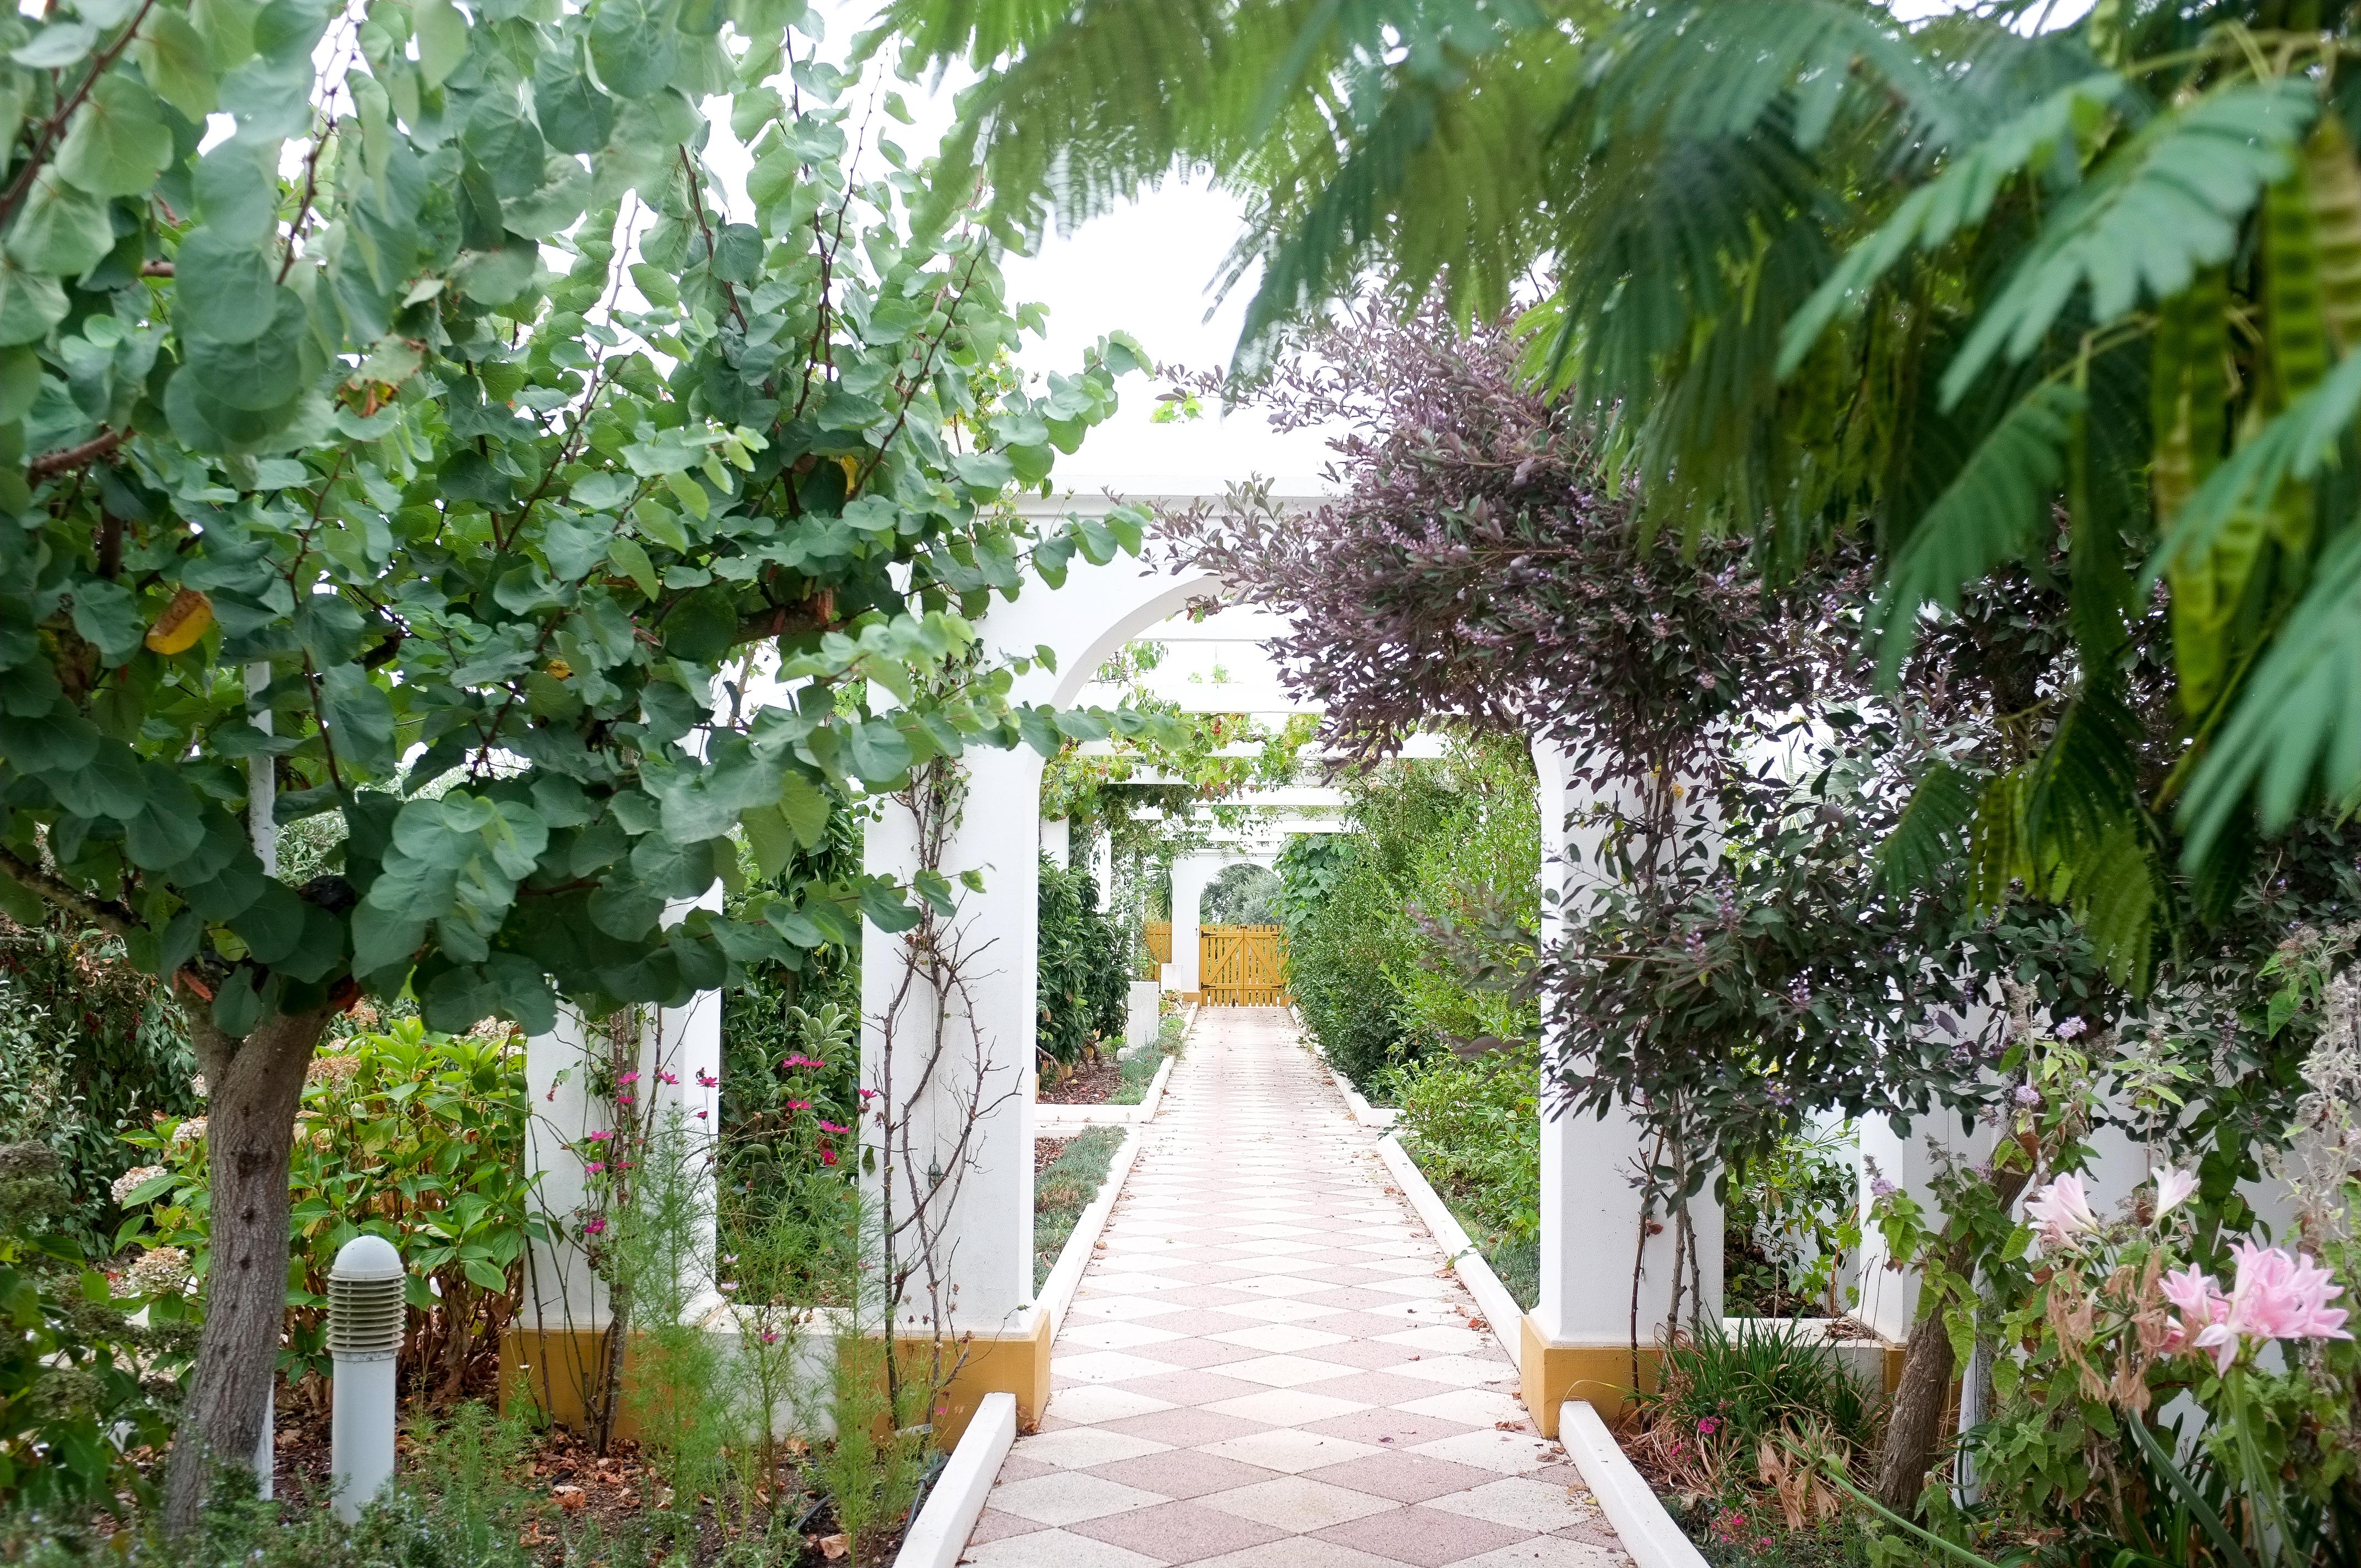 Le superbe jardin ibéro-mauresque de Jean-Paul Brigand et Ann Kenny.